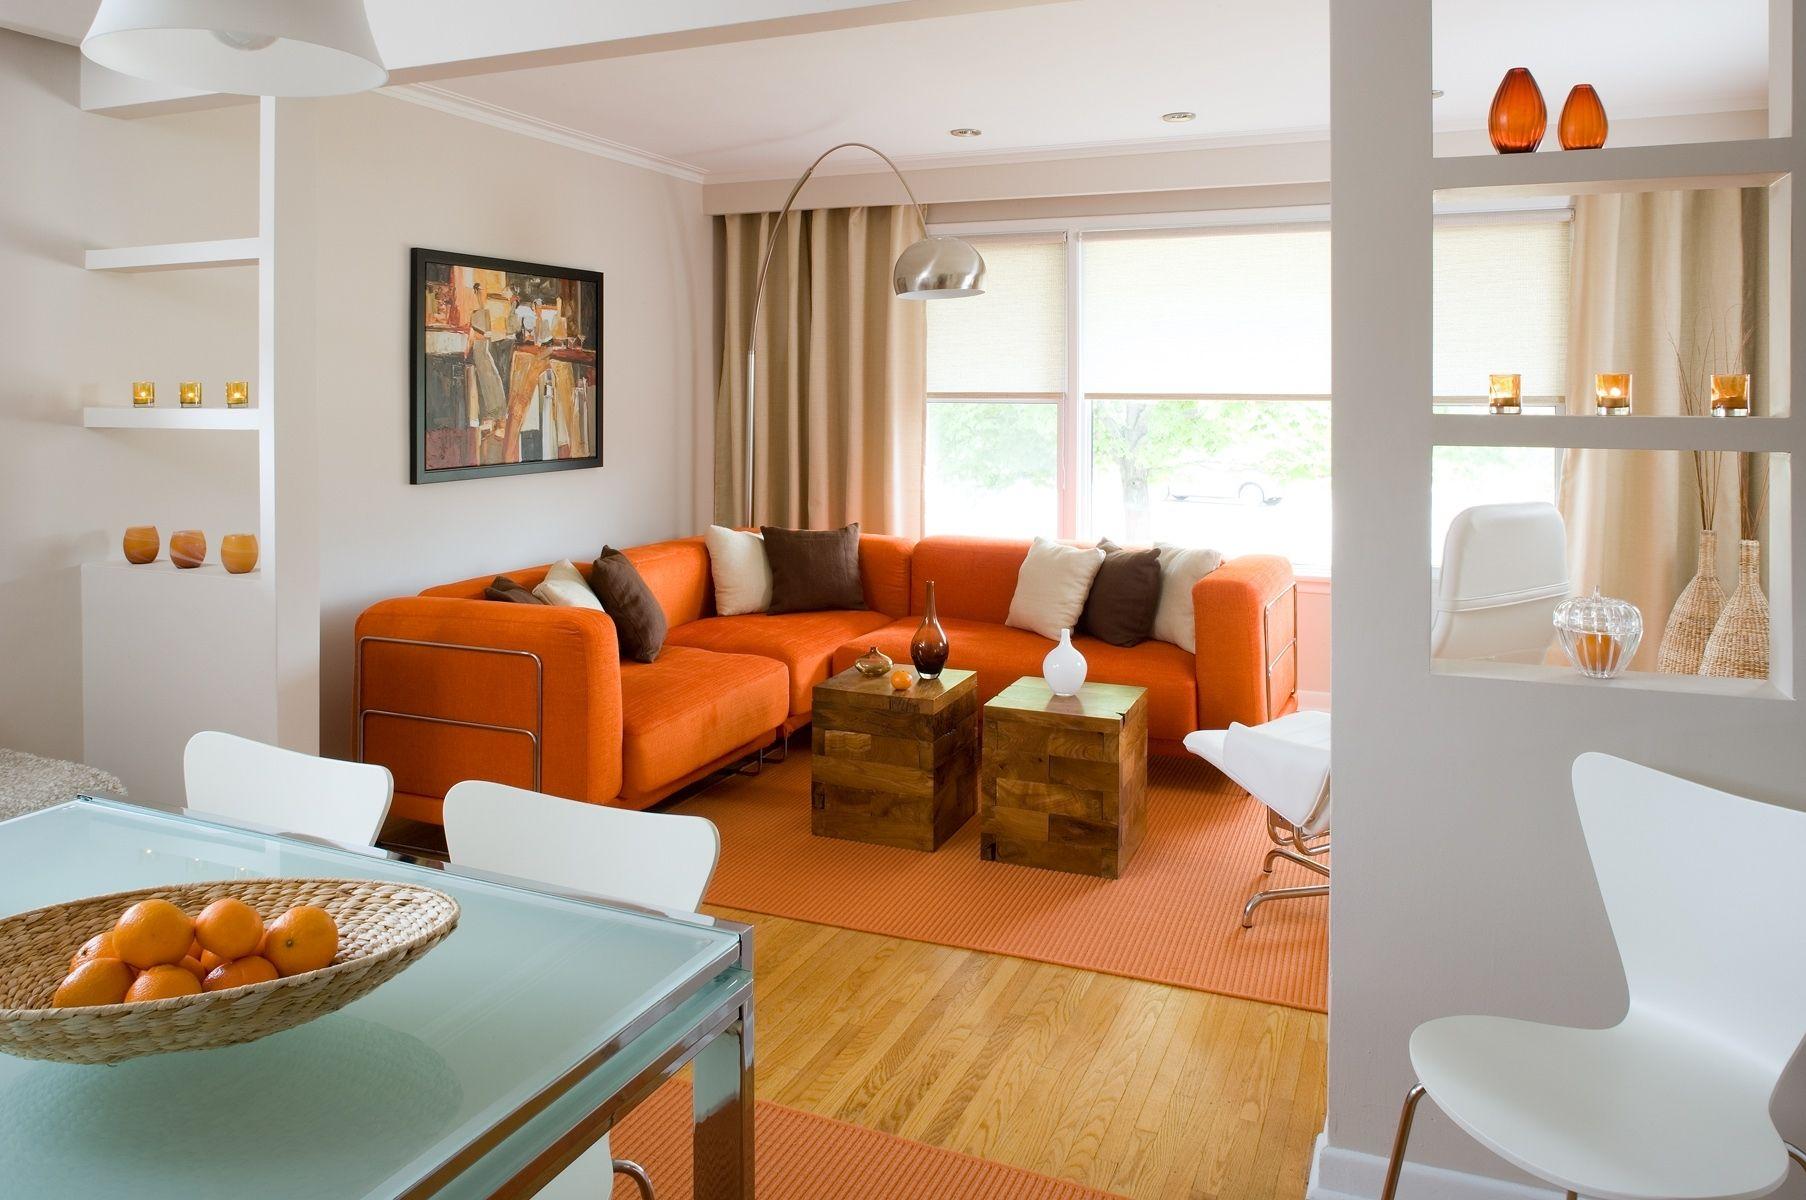 Atr vete con los salones en naranja casa pinterest for Decoracion hogar naranja